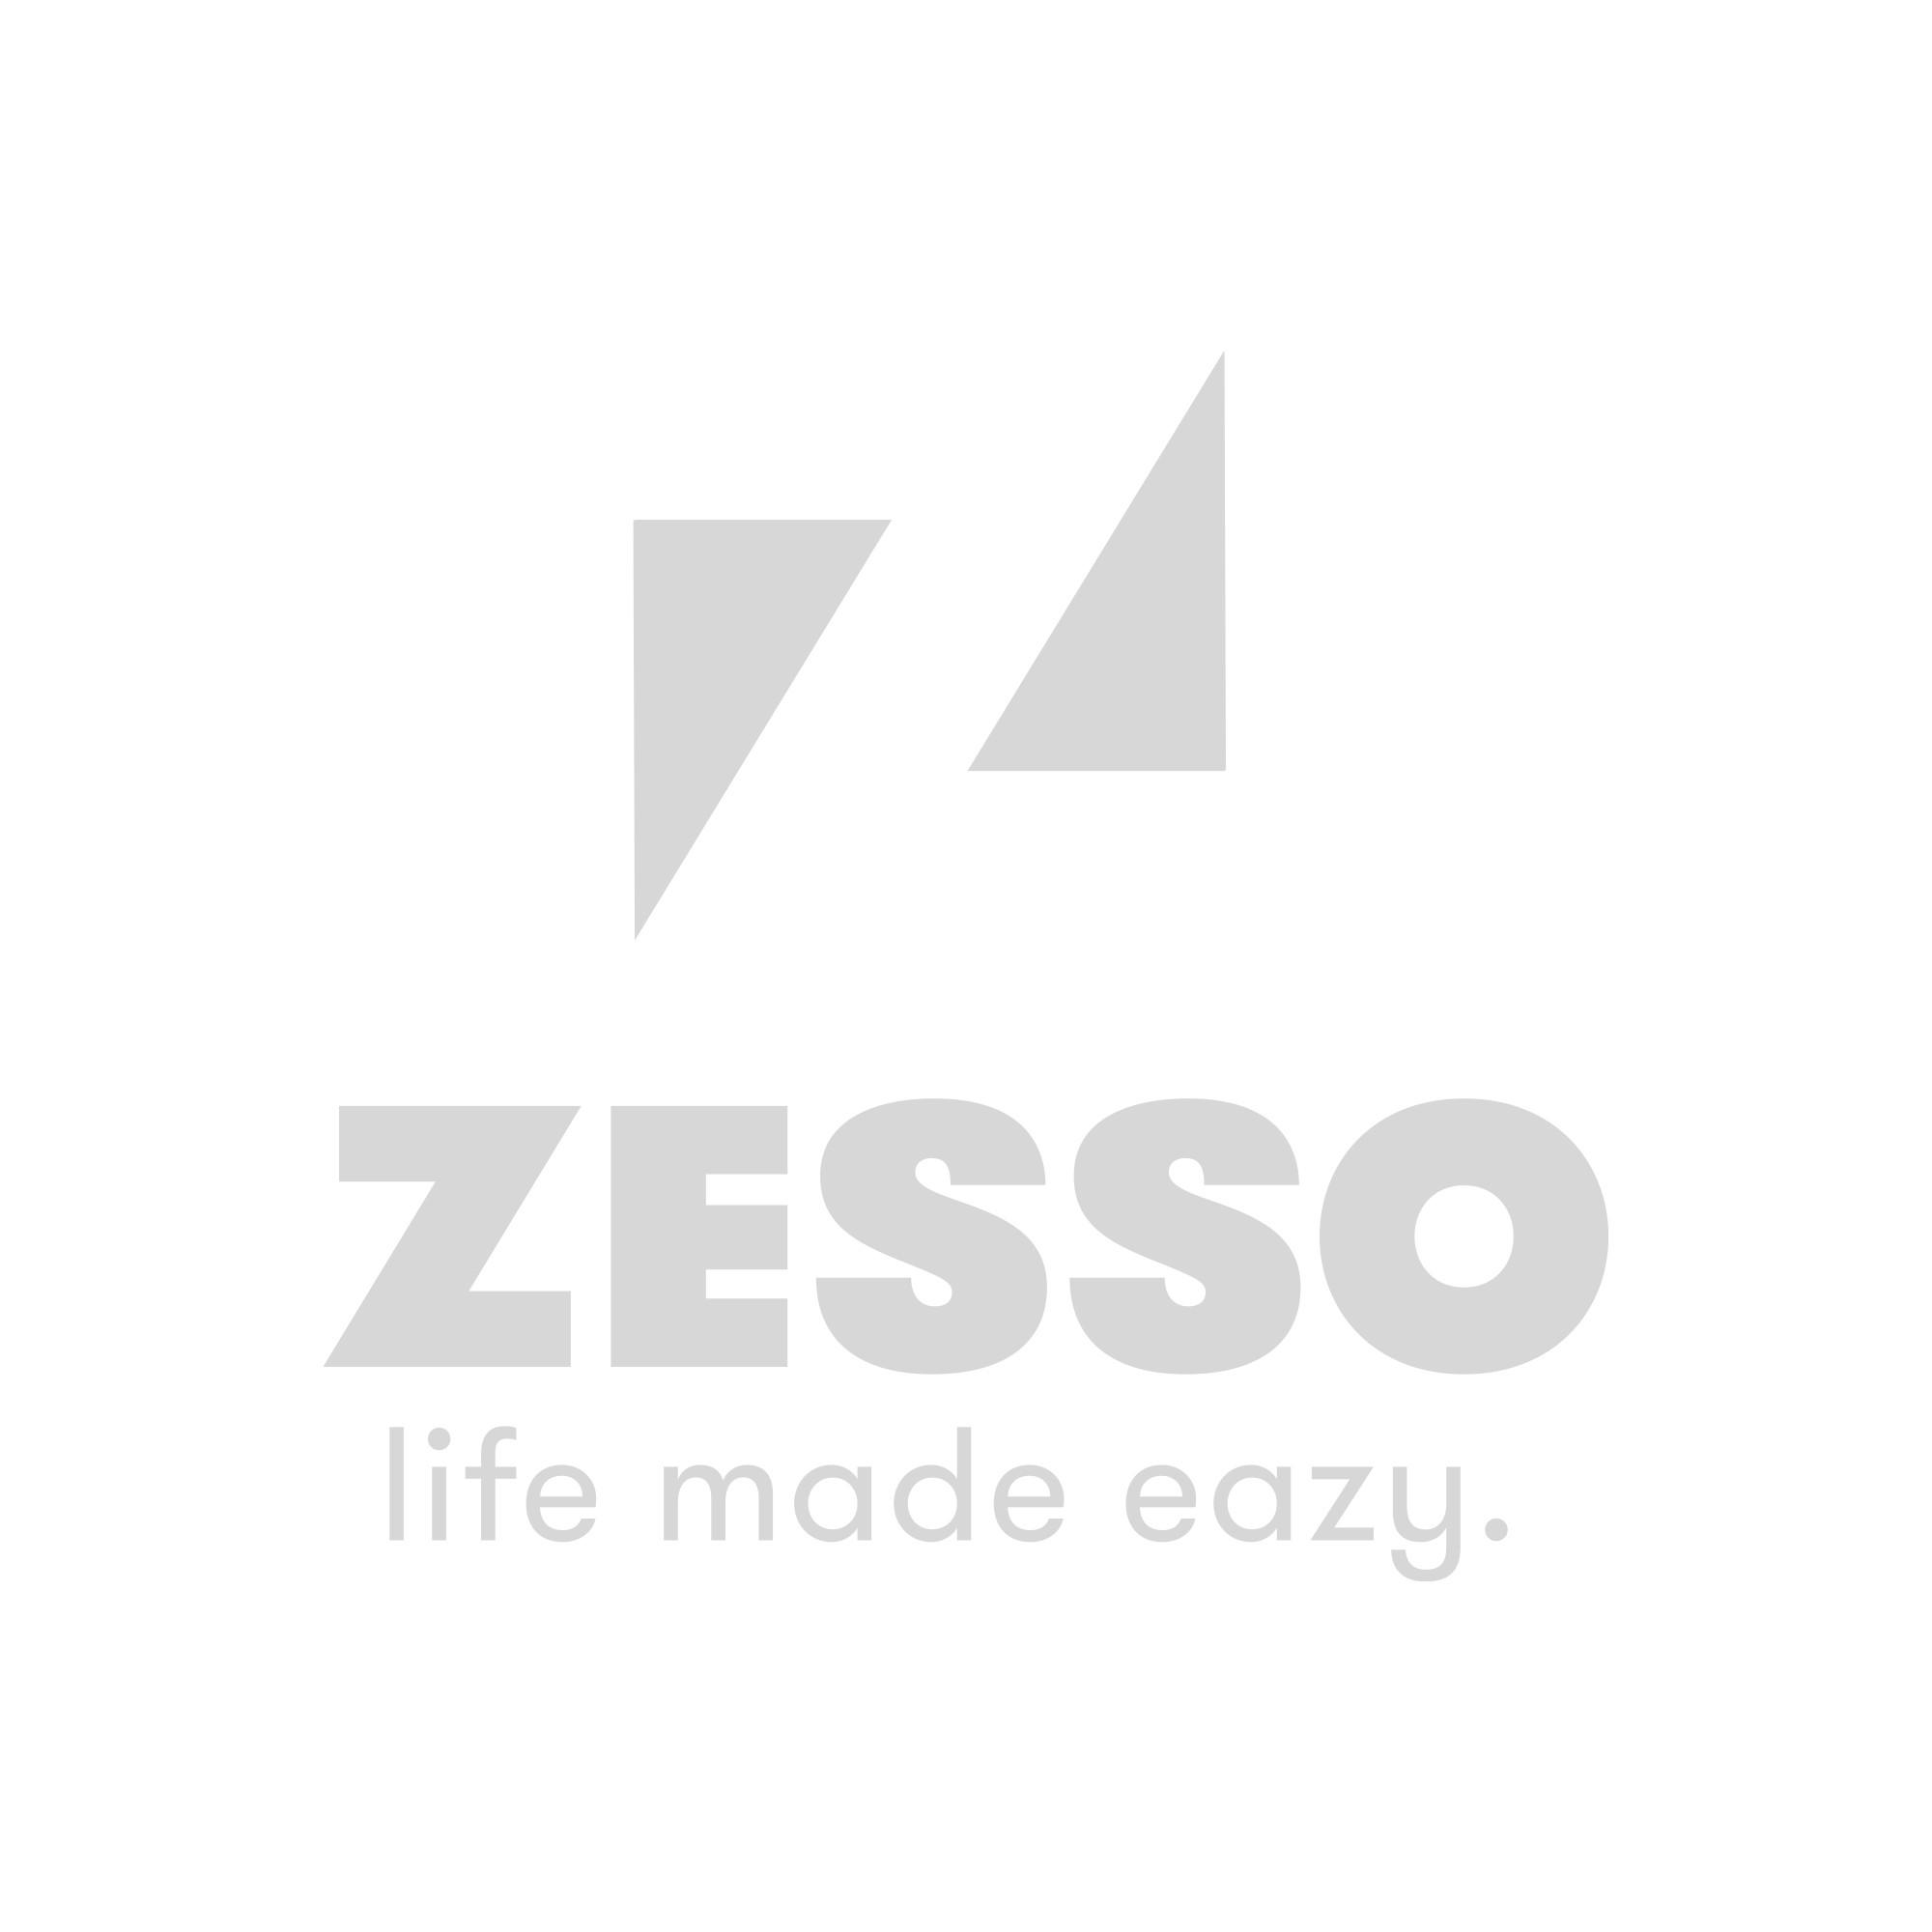 Eunoia Rideau de Porte Bambou 90 x 200 cm